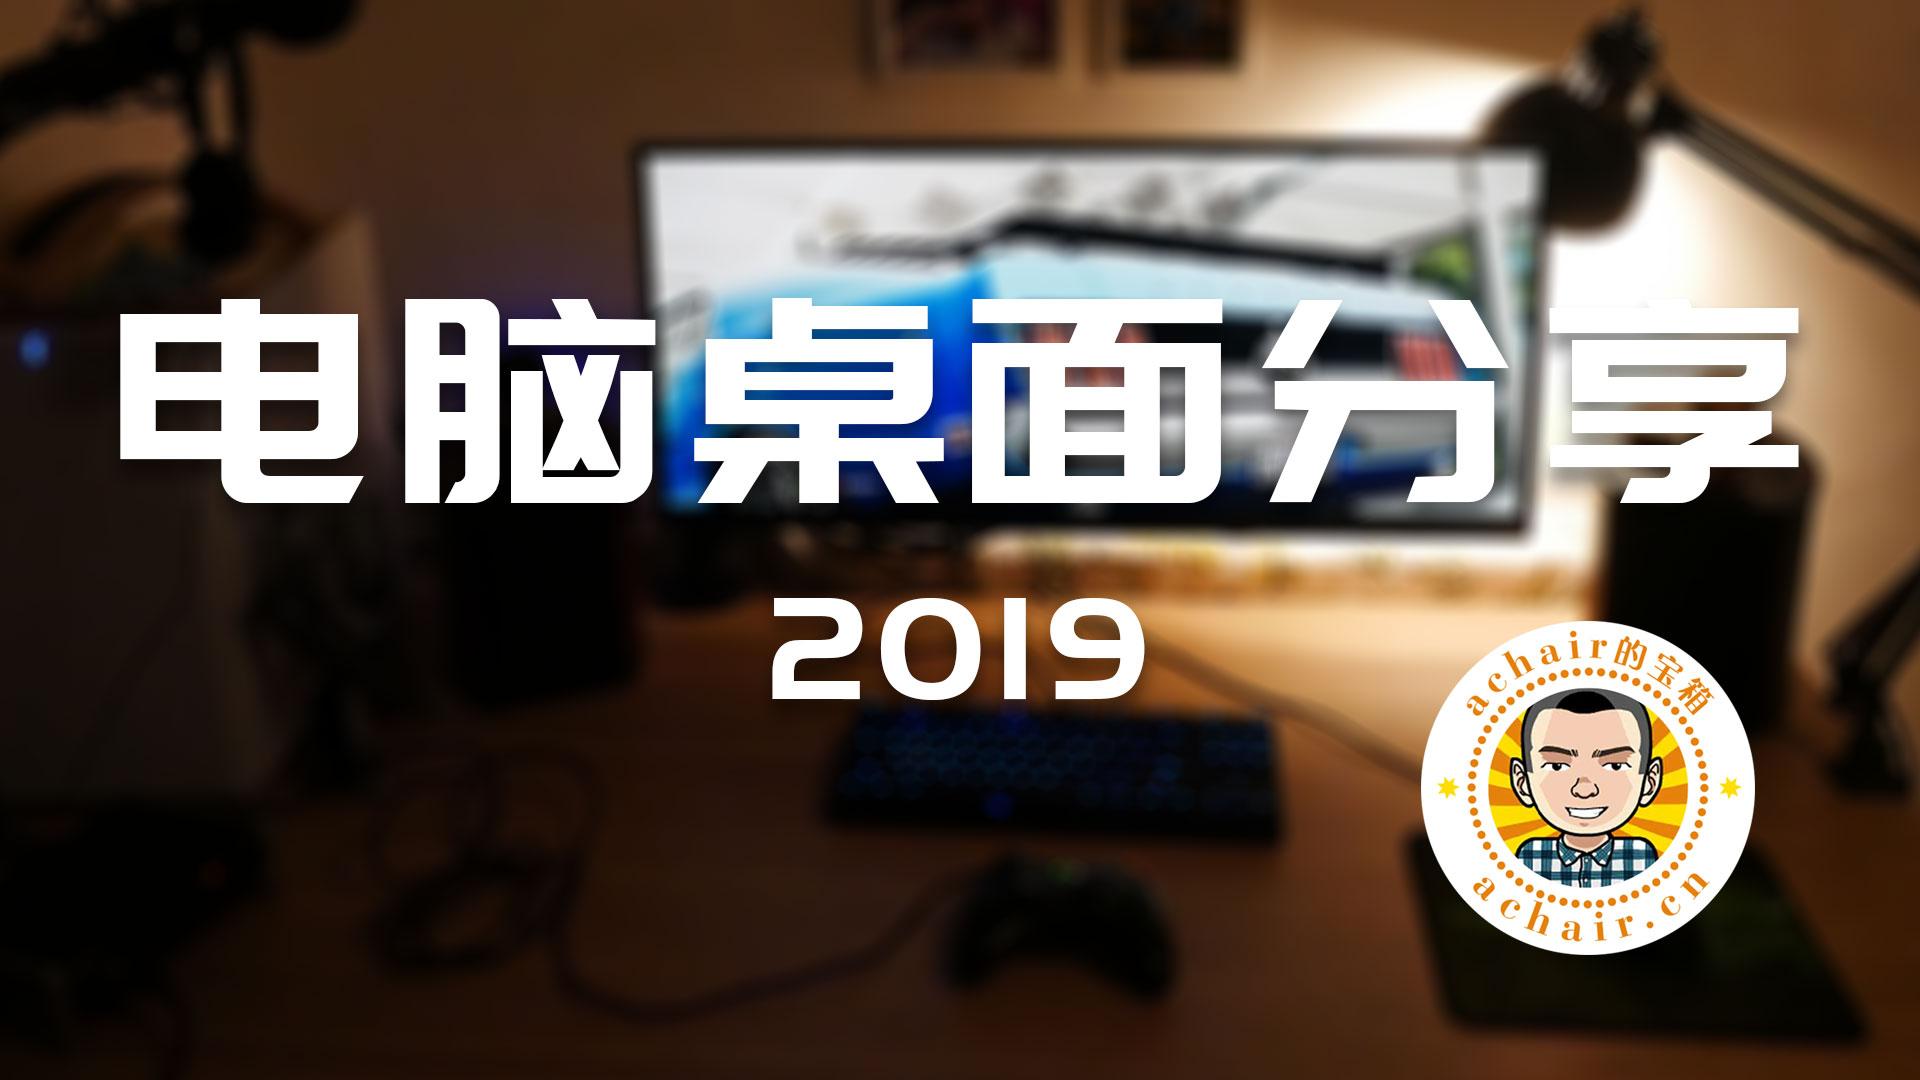 achair的电脑桌面2019 第2集 (台式电脑、Intel无线网卡,机械键盘,TASCAM声卡等) - desktop2